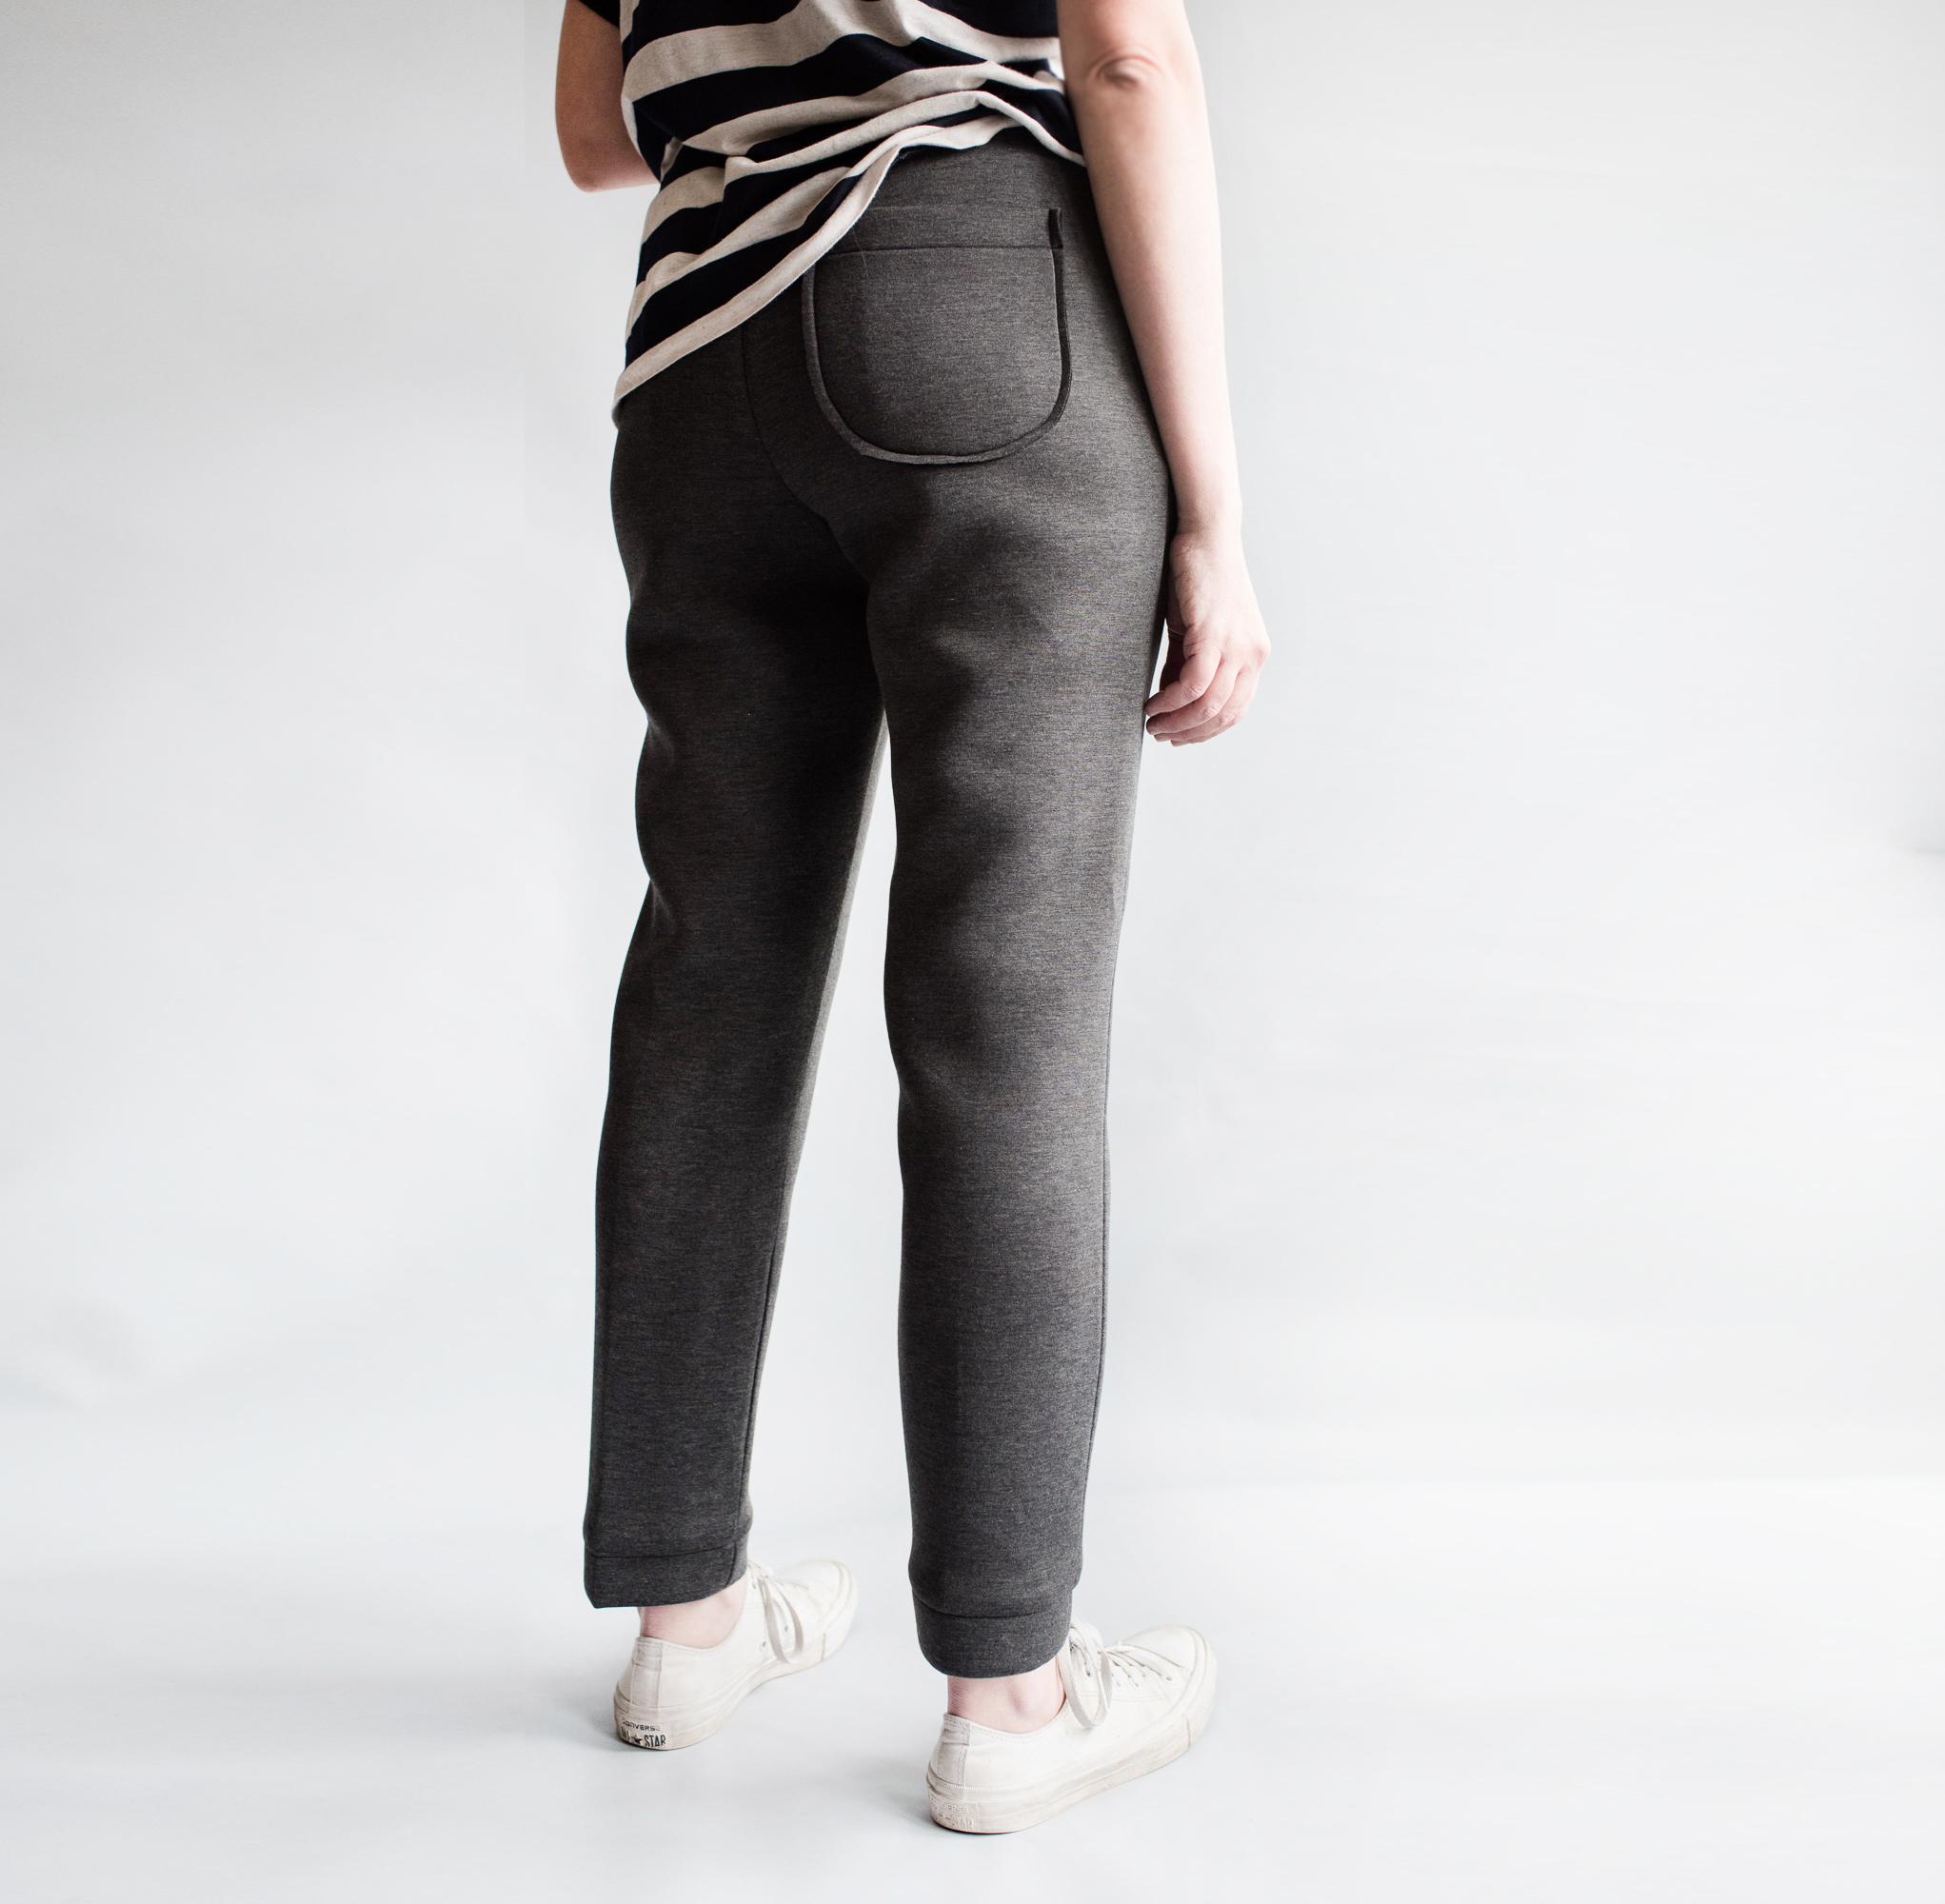 robinson-pdf-sewing-trouser13.jpg